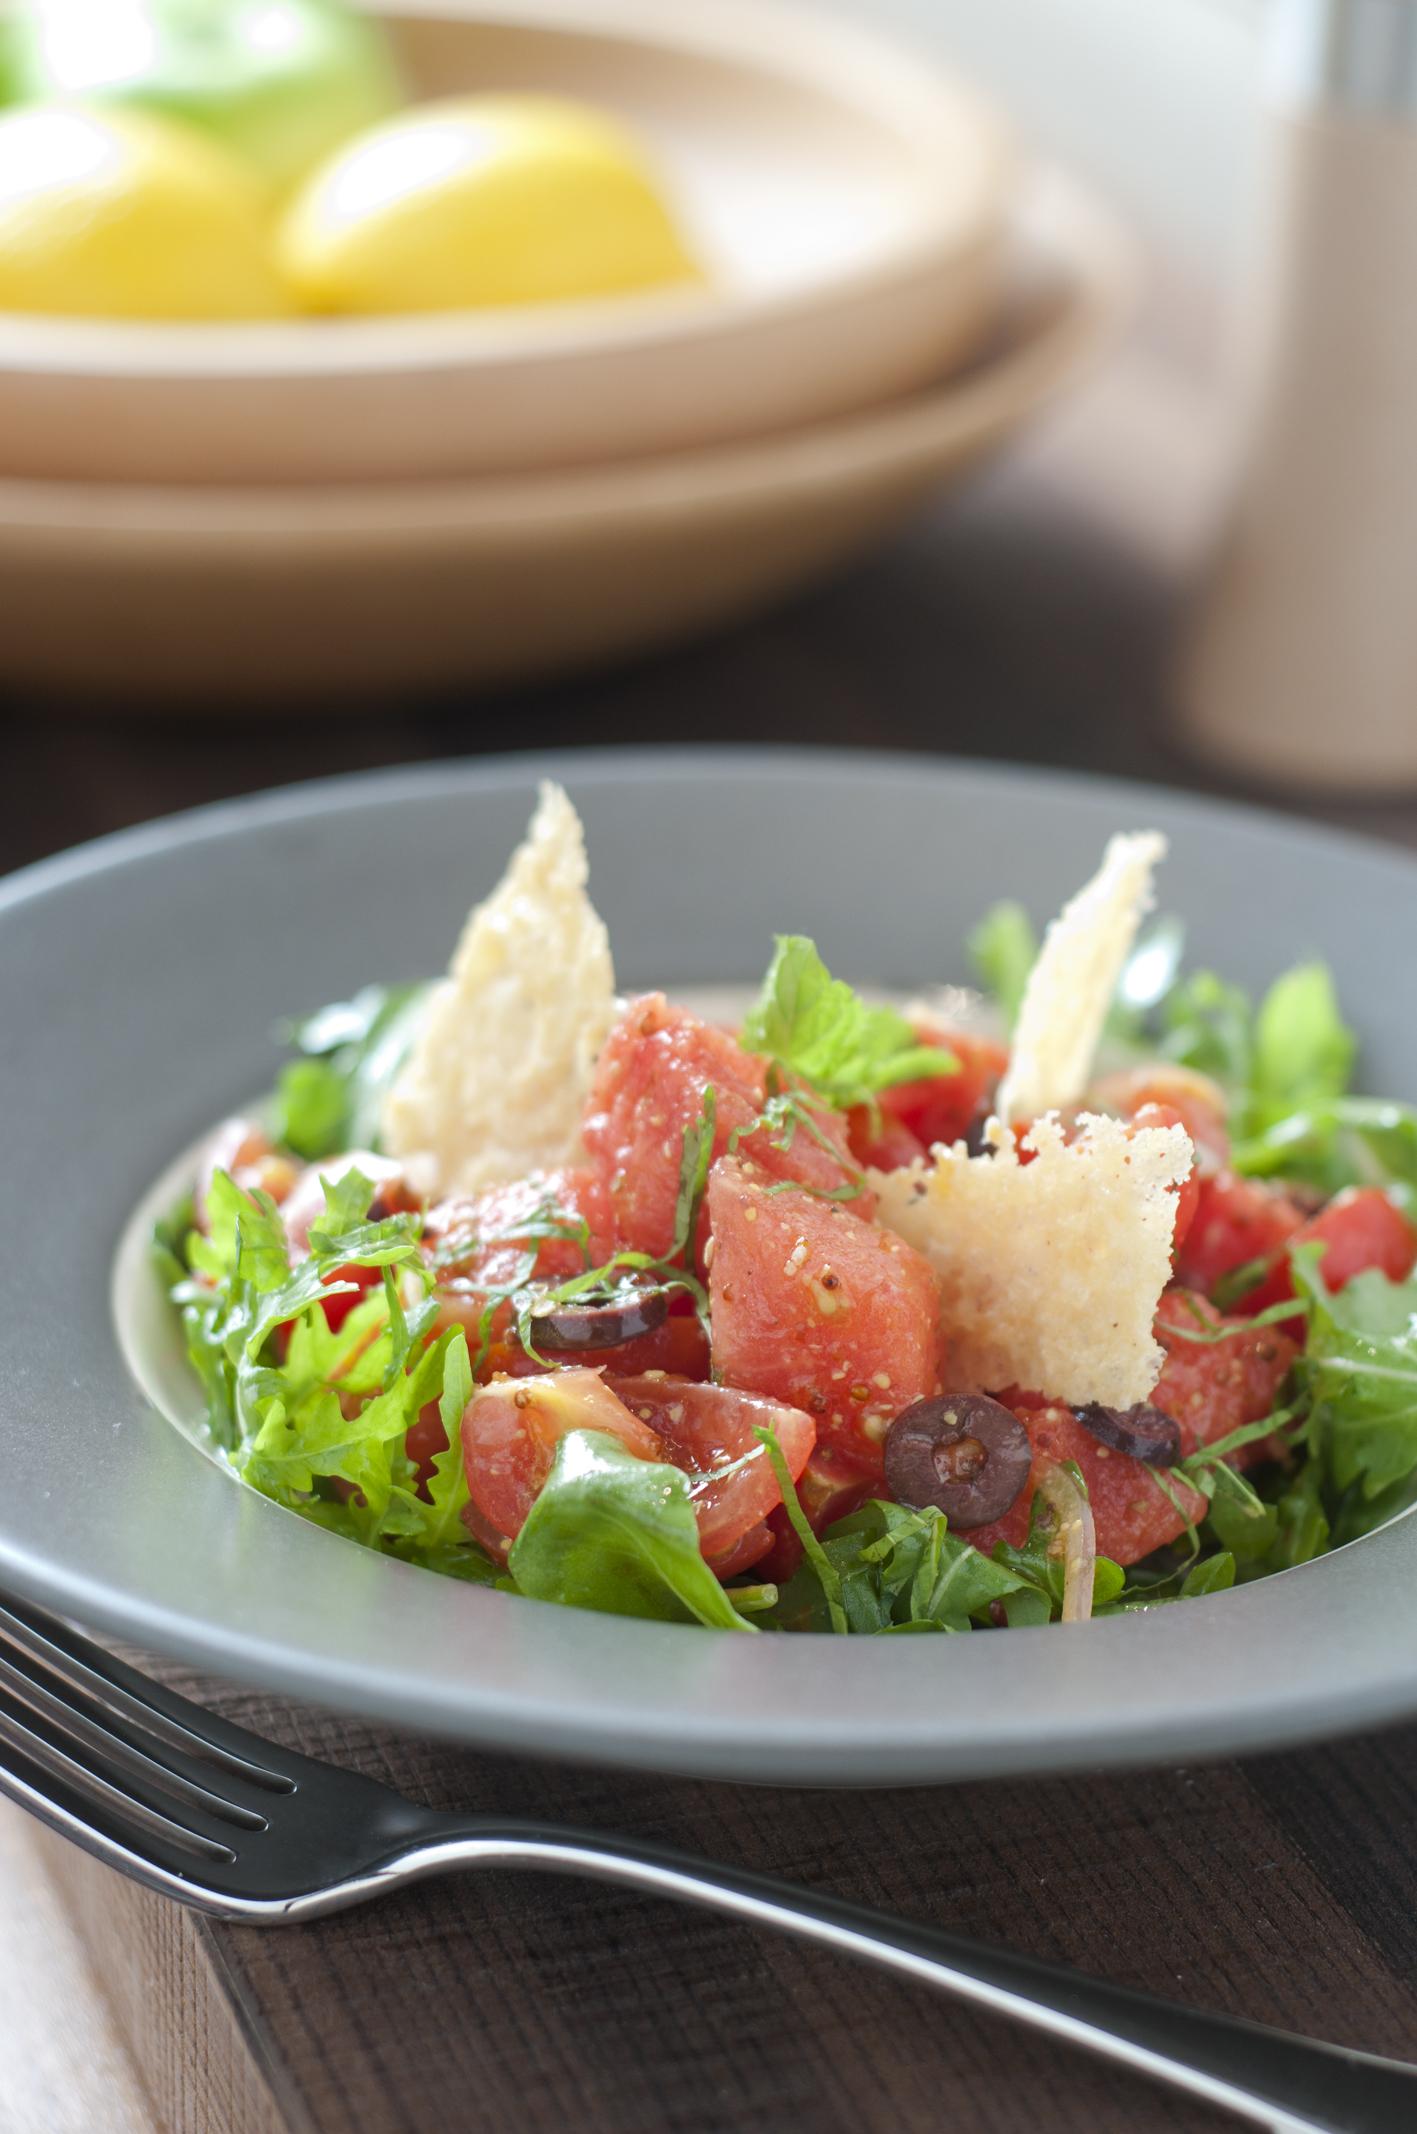 watermelon-and-tomato-salad